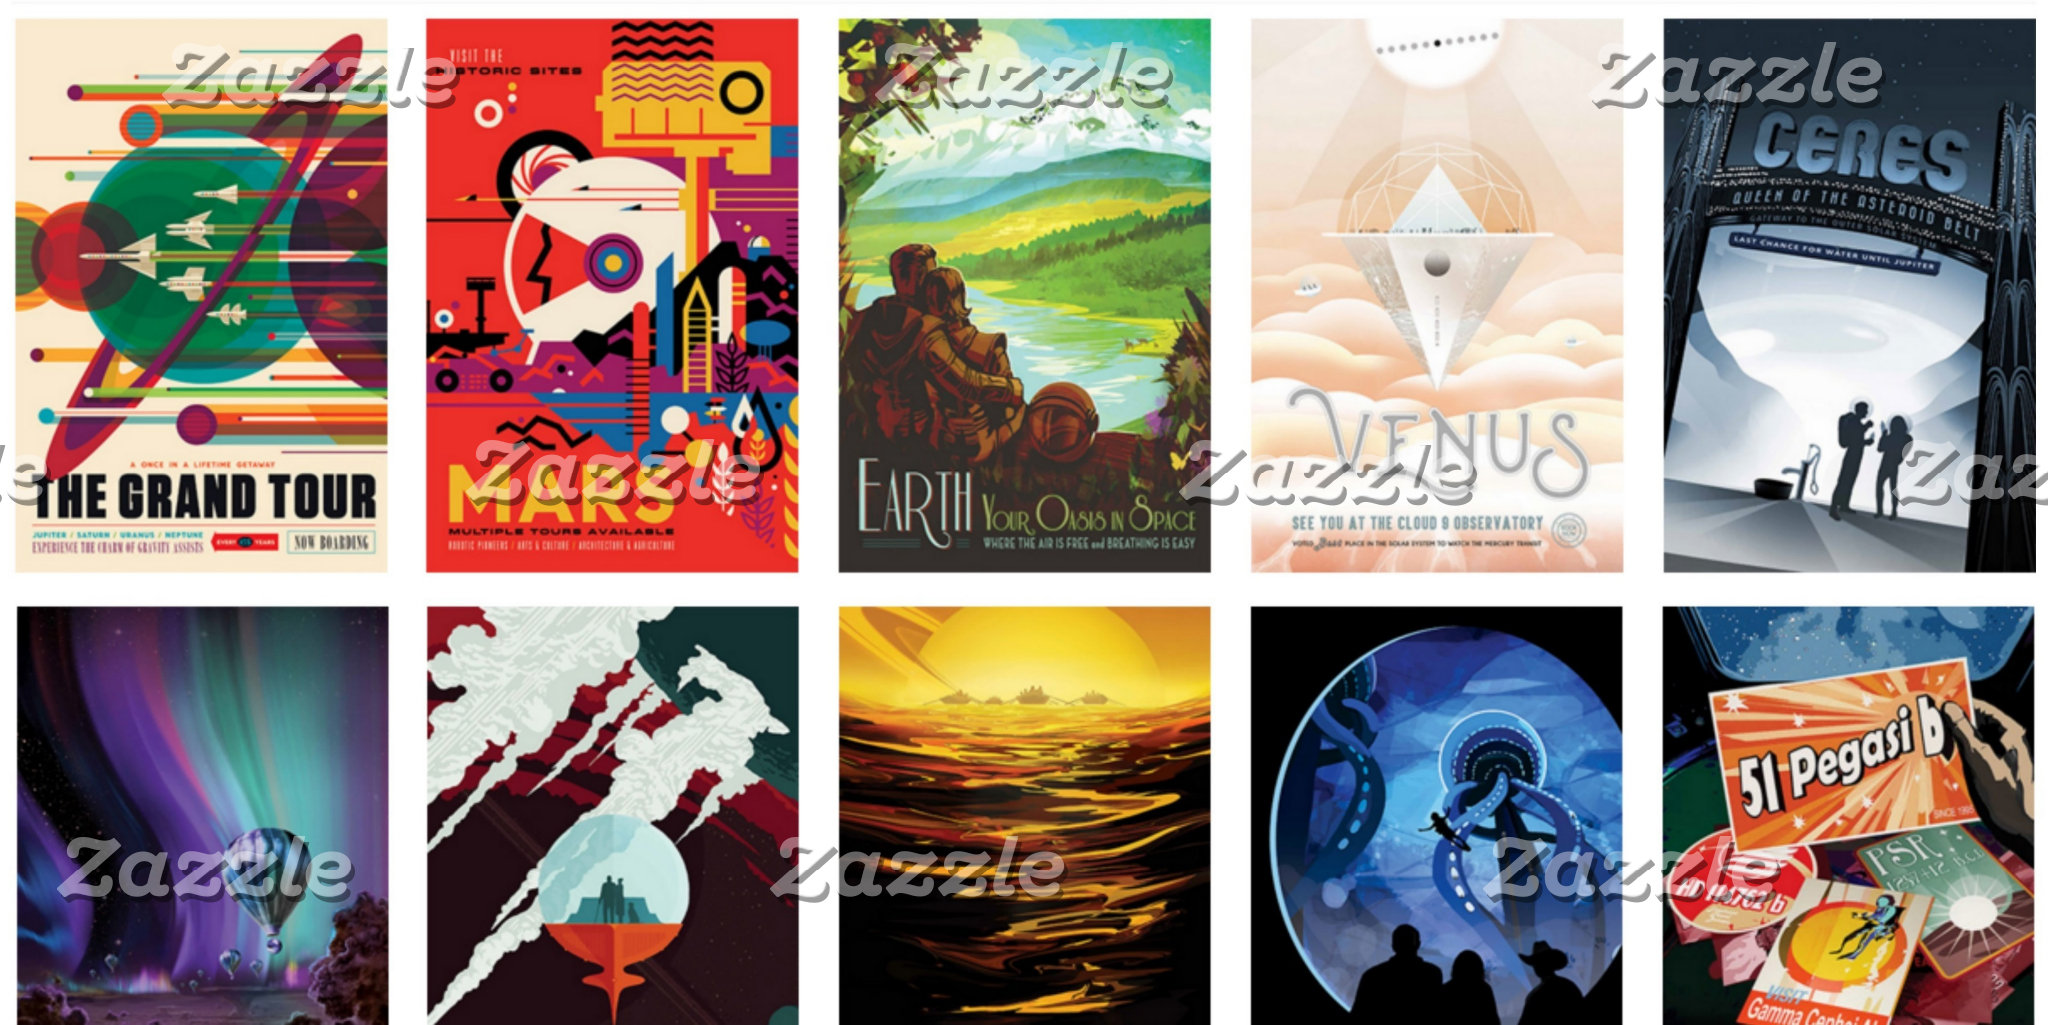 Retro-Futuristic Space Travel Posters